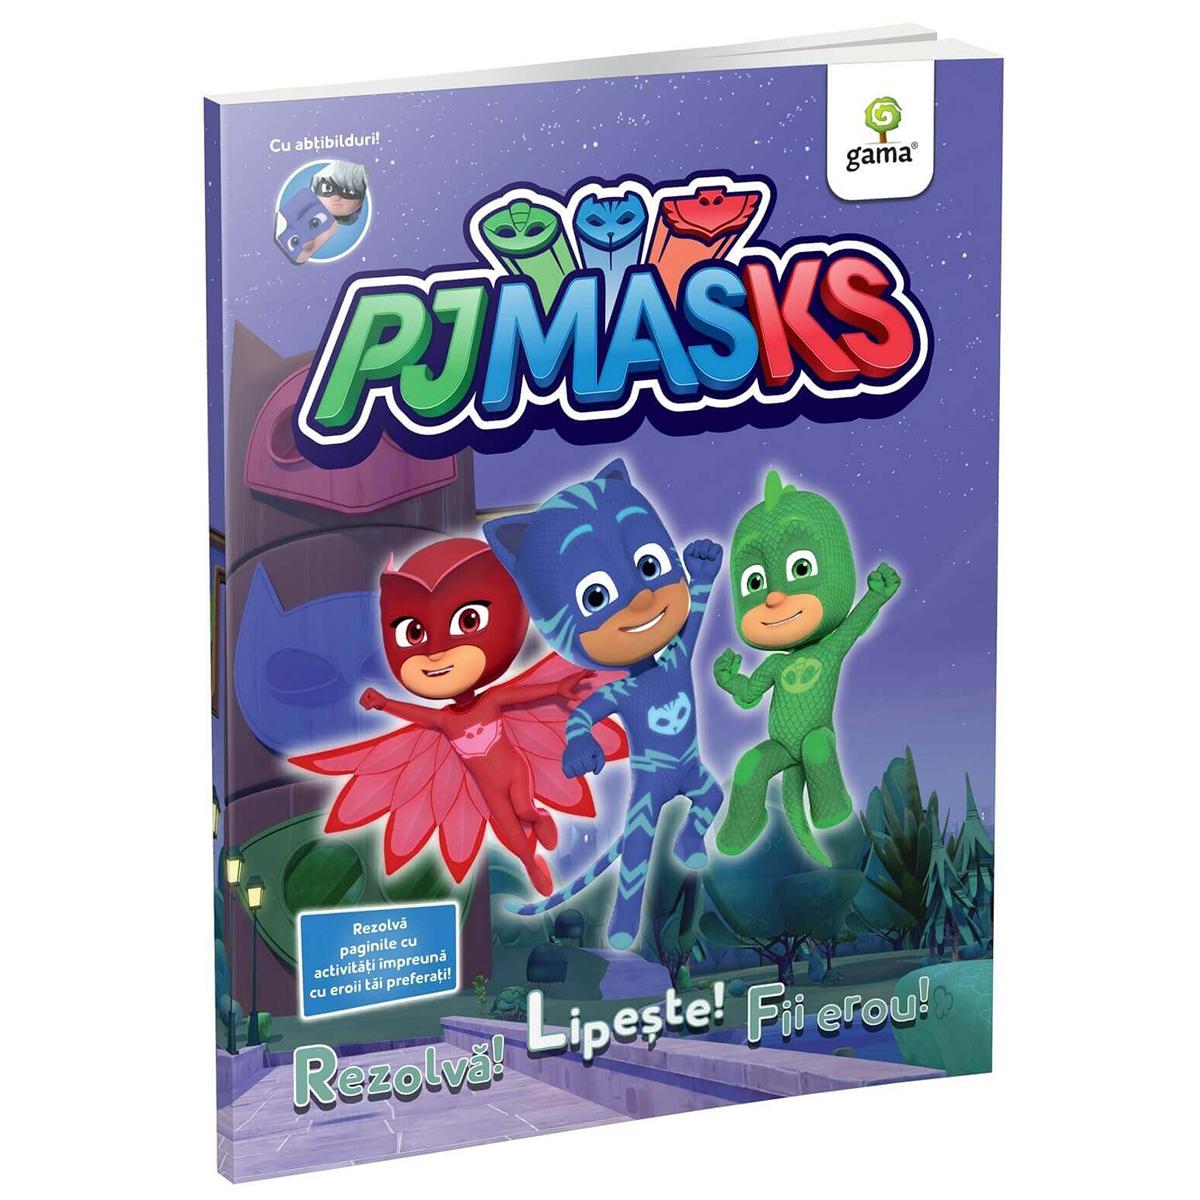 Carte Editura Gama, PJ Masks Rezolva! Lipeste! Fii Erou!